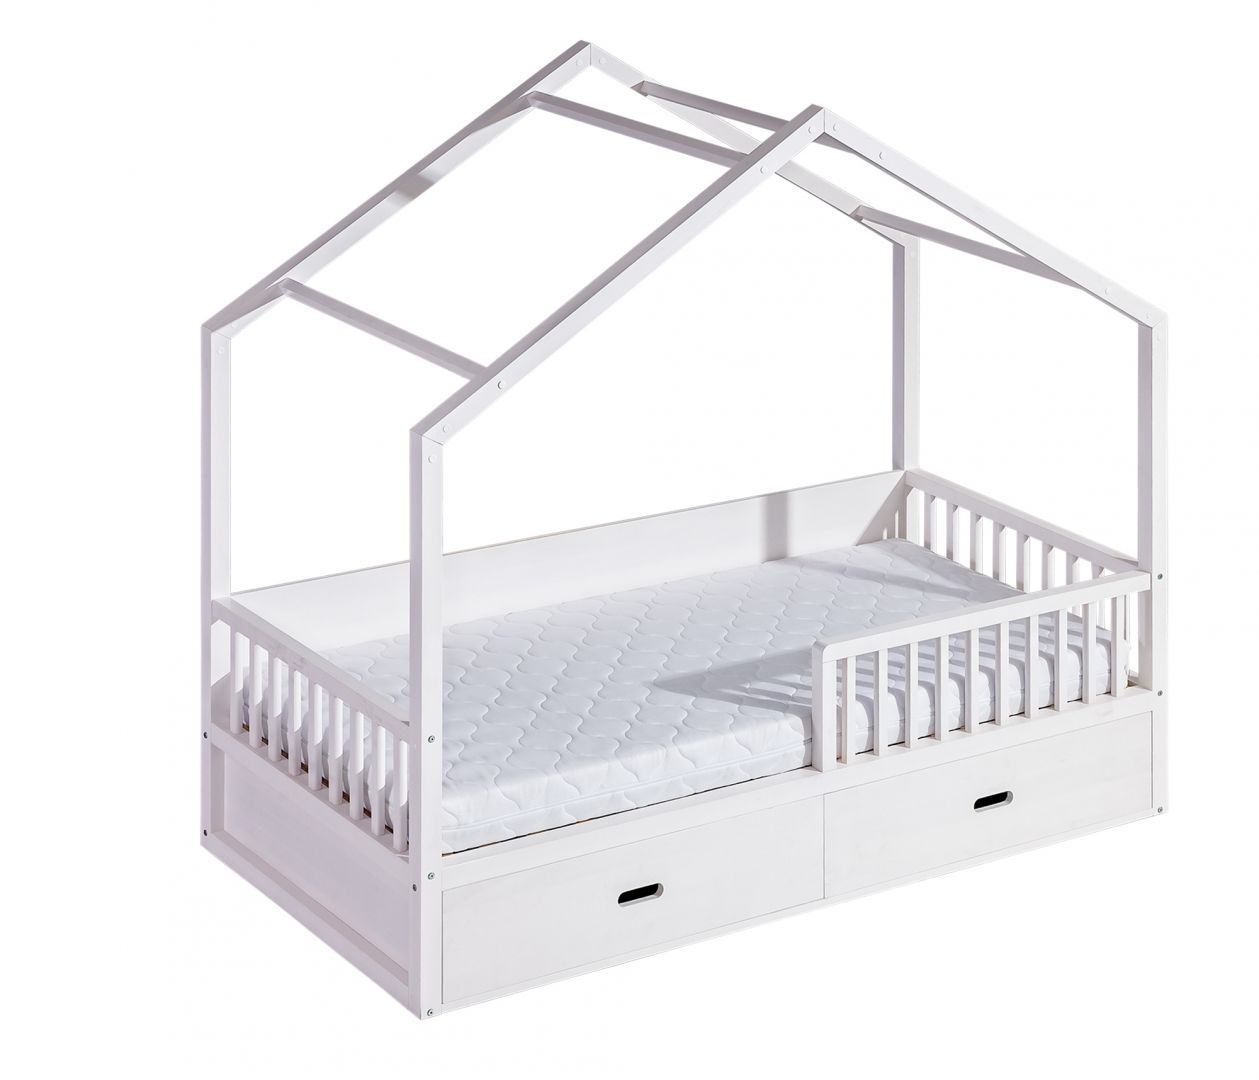 Tématické postele